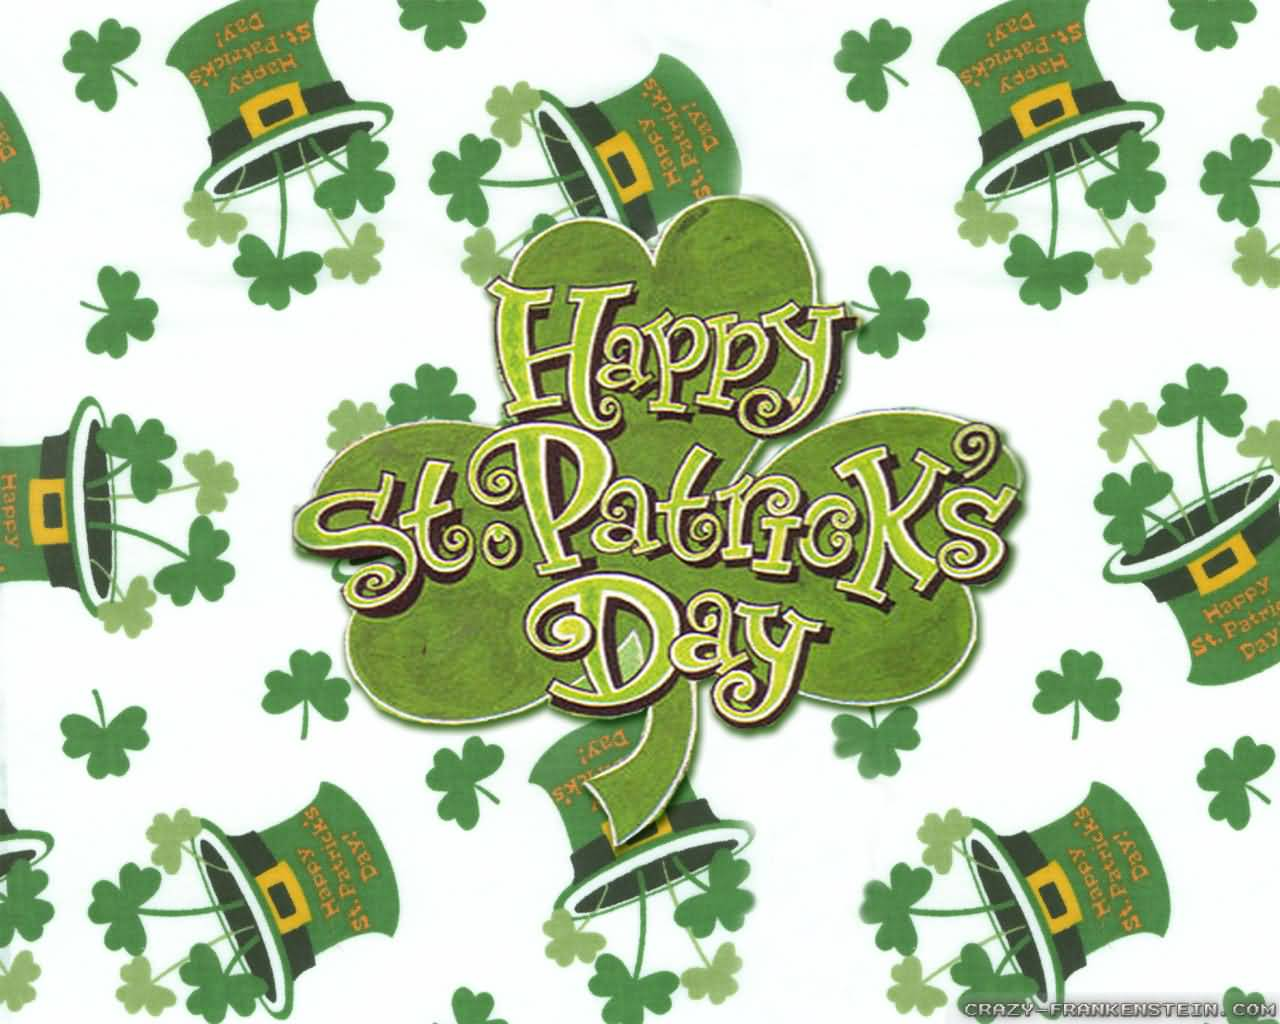 Happy Saint Patrick's Day Wishes